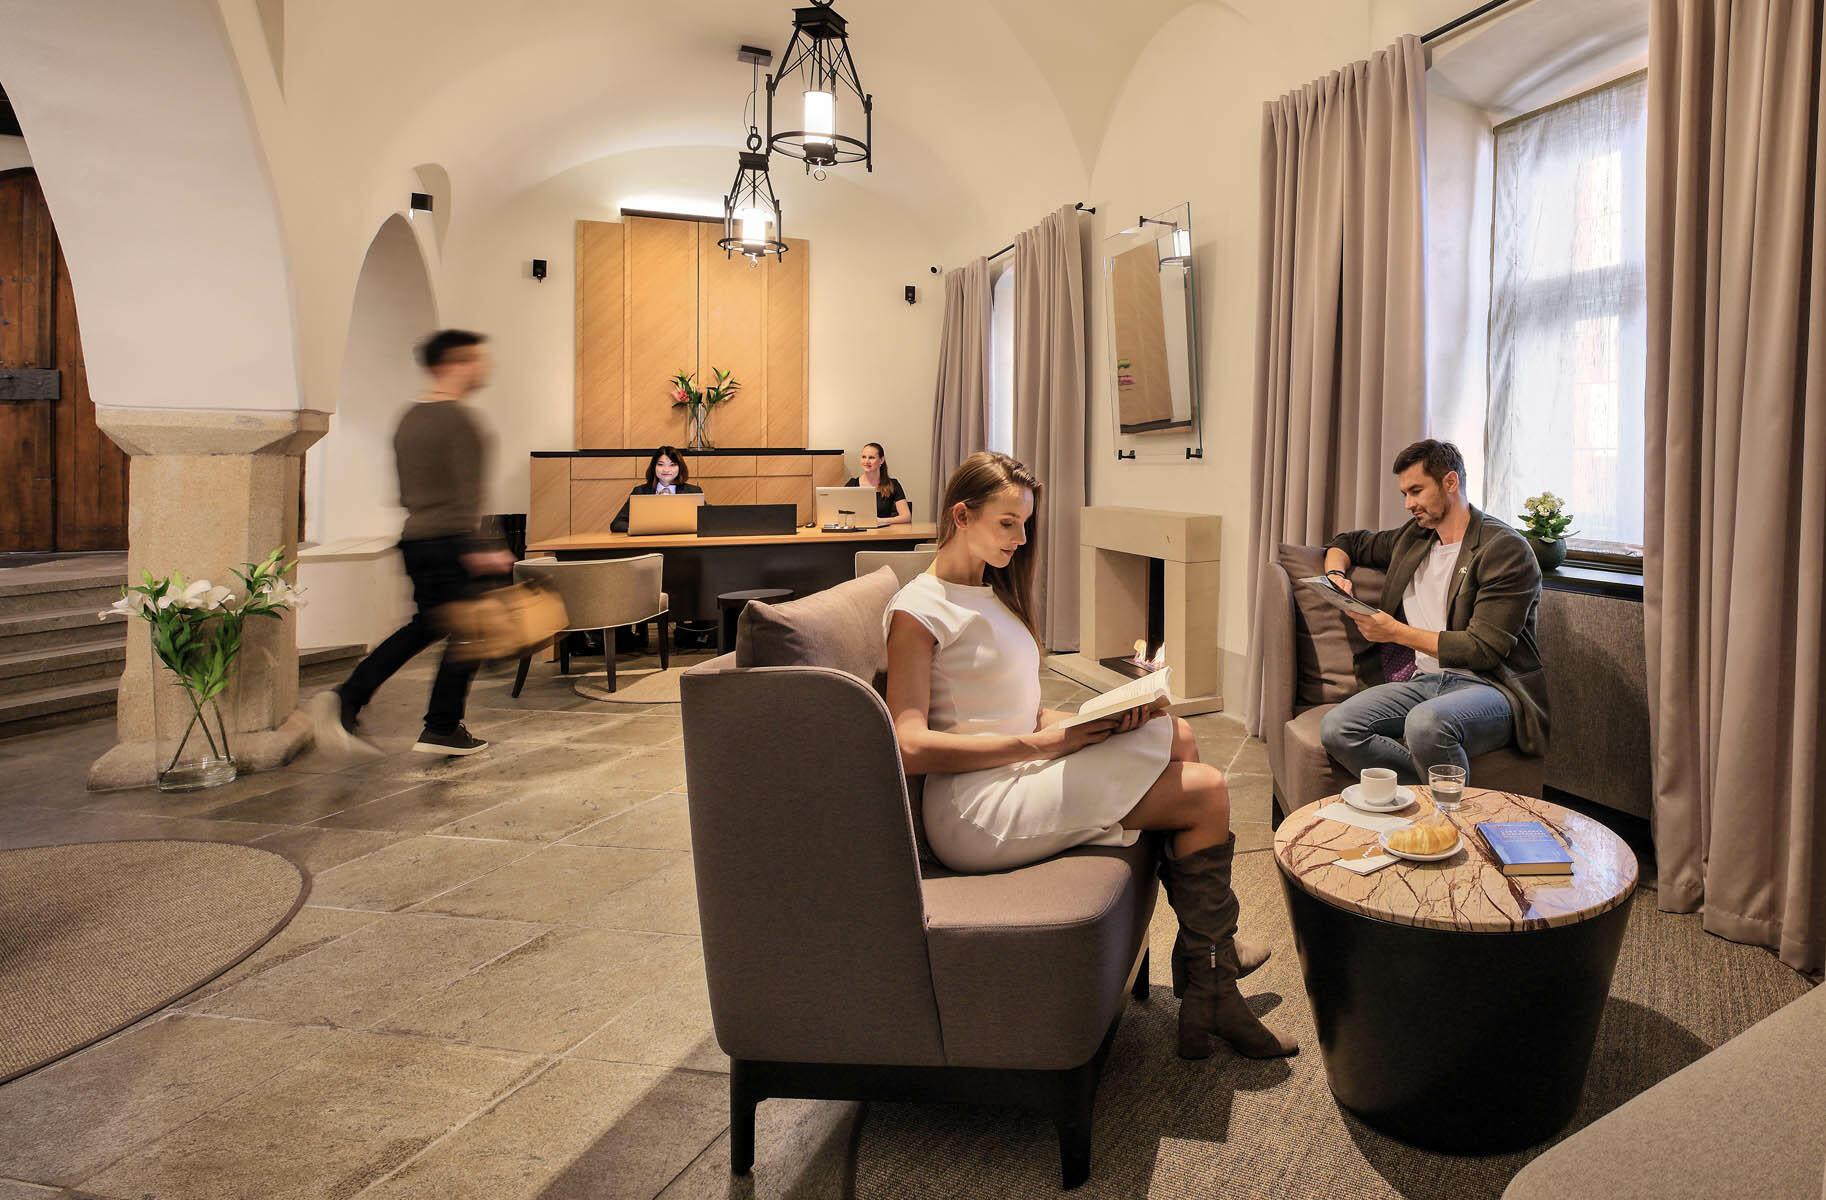 Reception Lobby at Hotel Old Inn, Český Krumlov